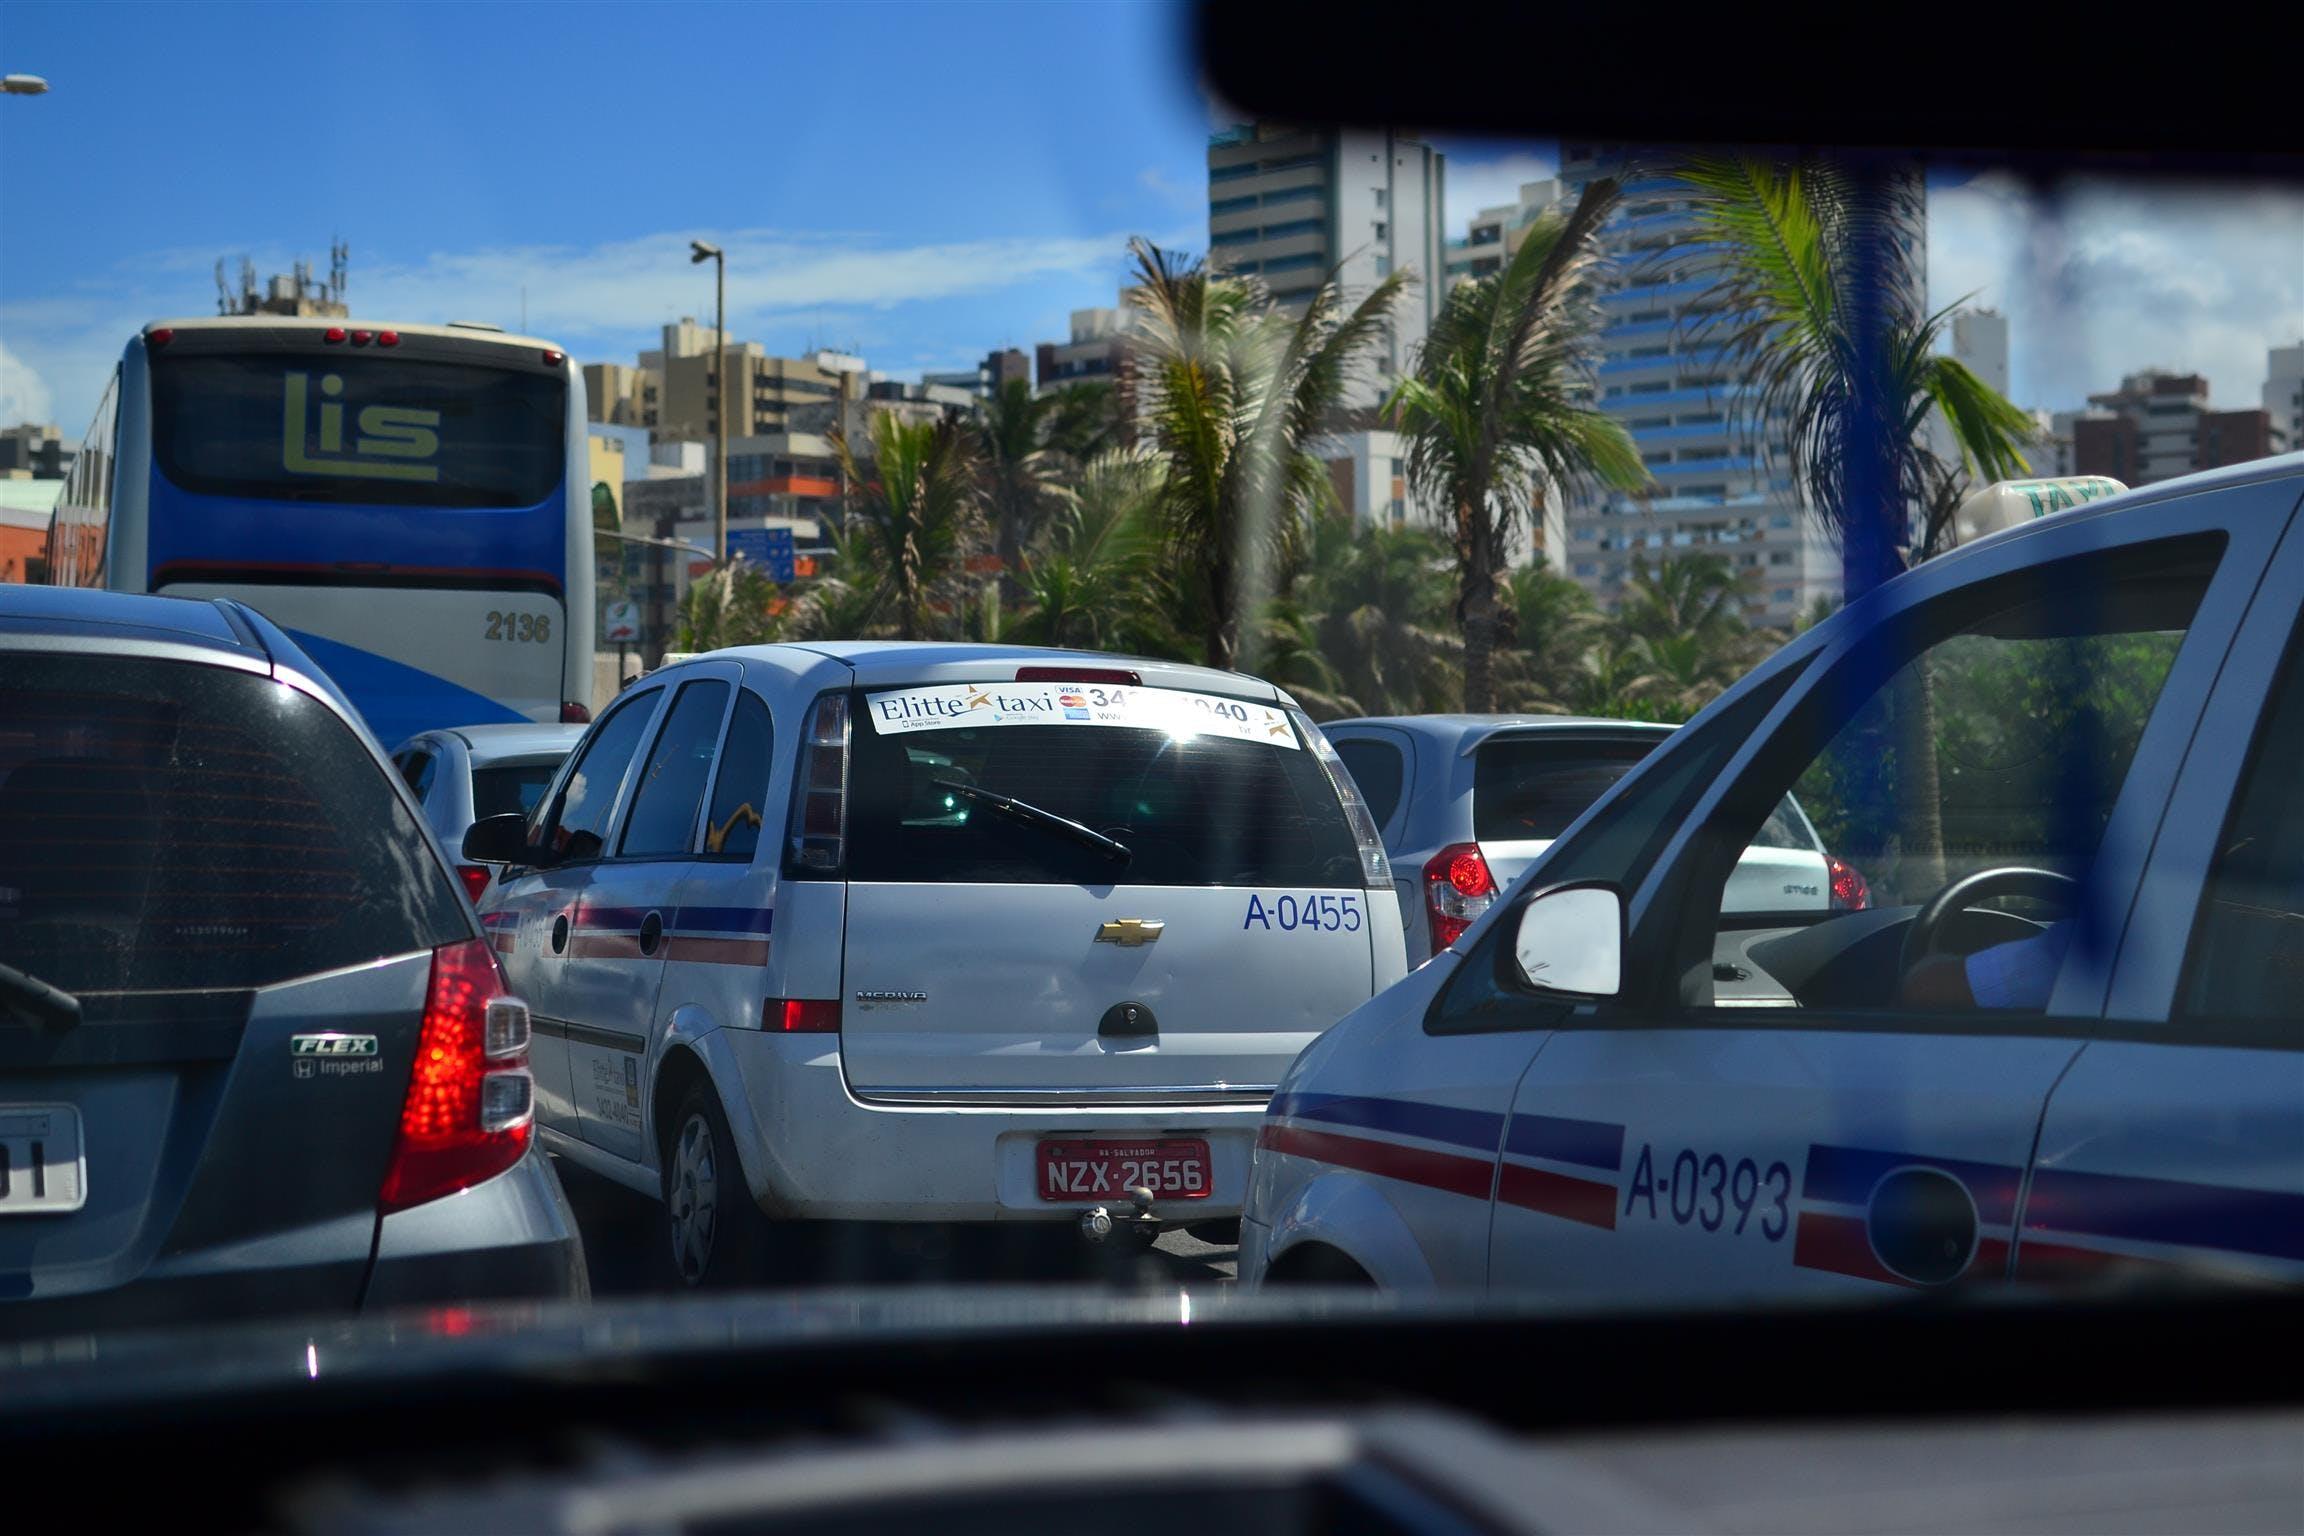 Free stock photo of cars, traffic, nikon, 35mm